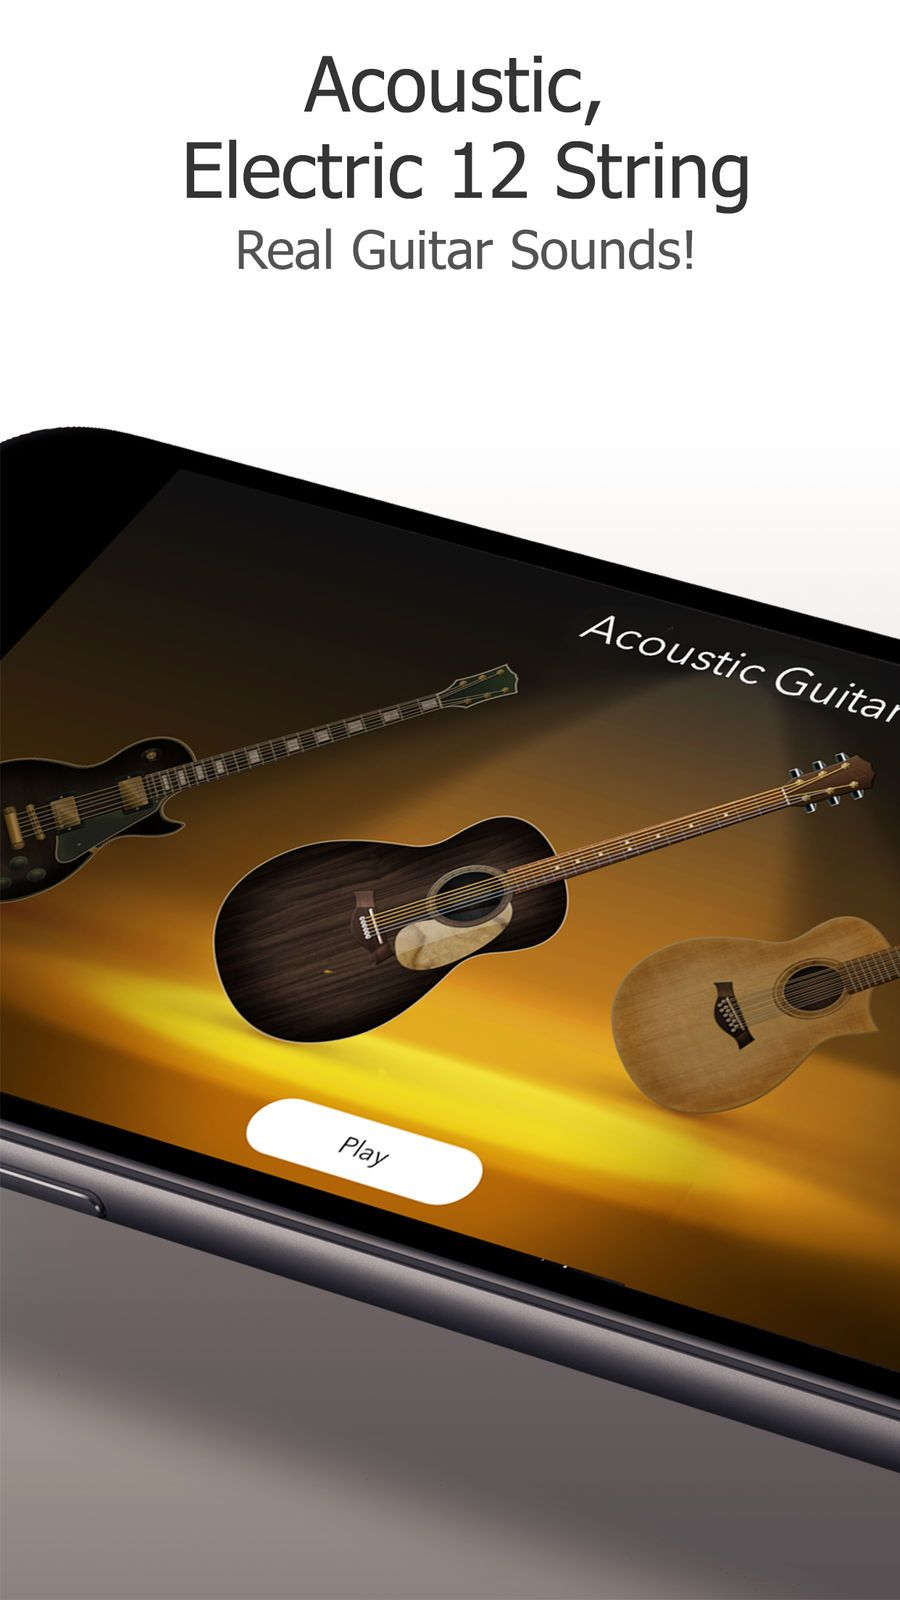 Guitar Chords Tabs Cool Iphone Game Pinterest Guitar Chords